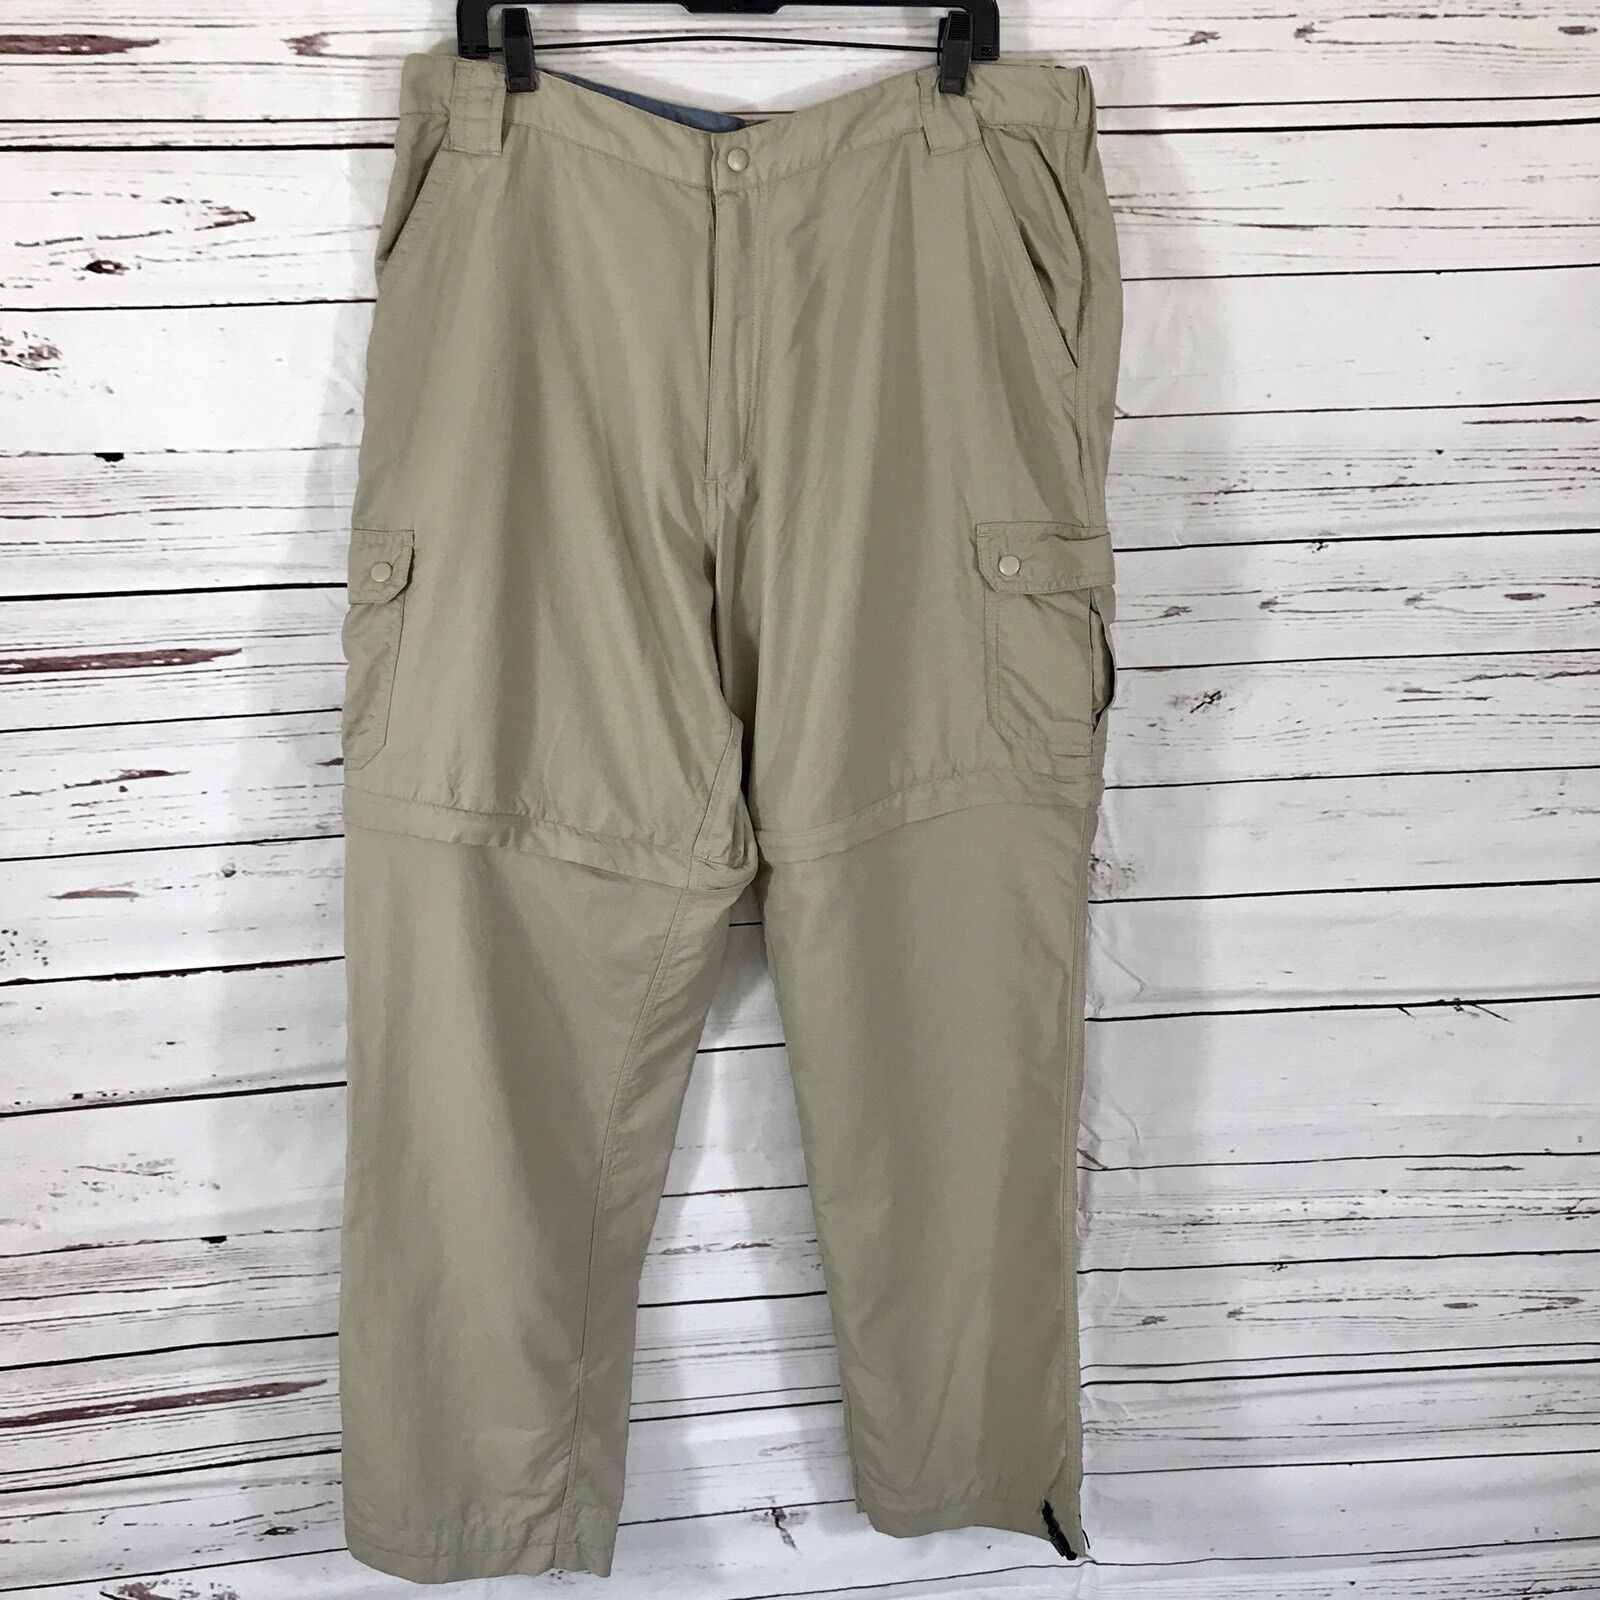 Dakota Grizzly Men's  Congreenible Khaki Pants size XLT Hiking Fishing Nylon